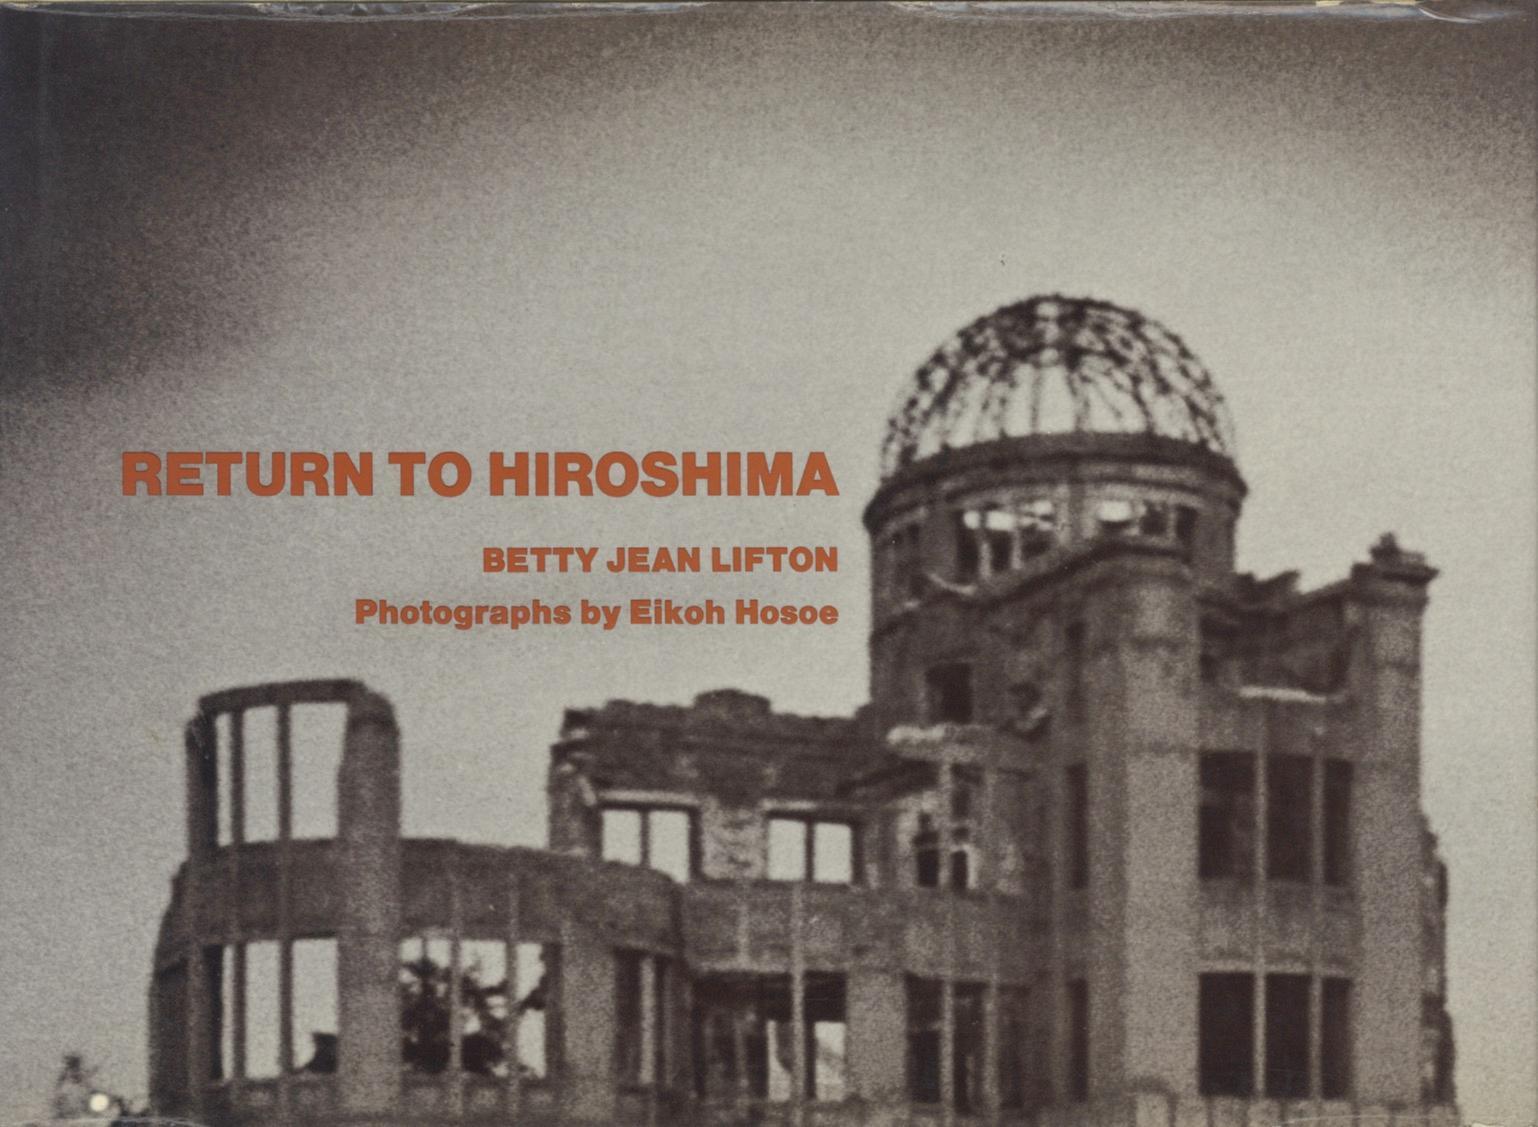 RETURN TO HIROSHIMA.; Photographs by Eikoh Hosoe [HOSOE]. Lifton, Betty Jean